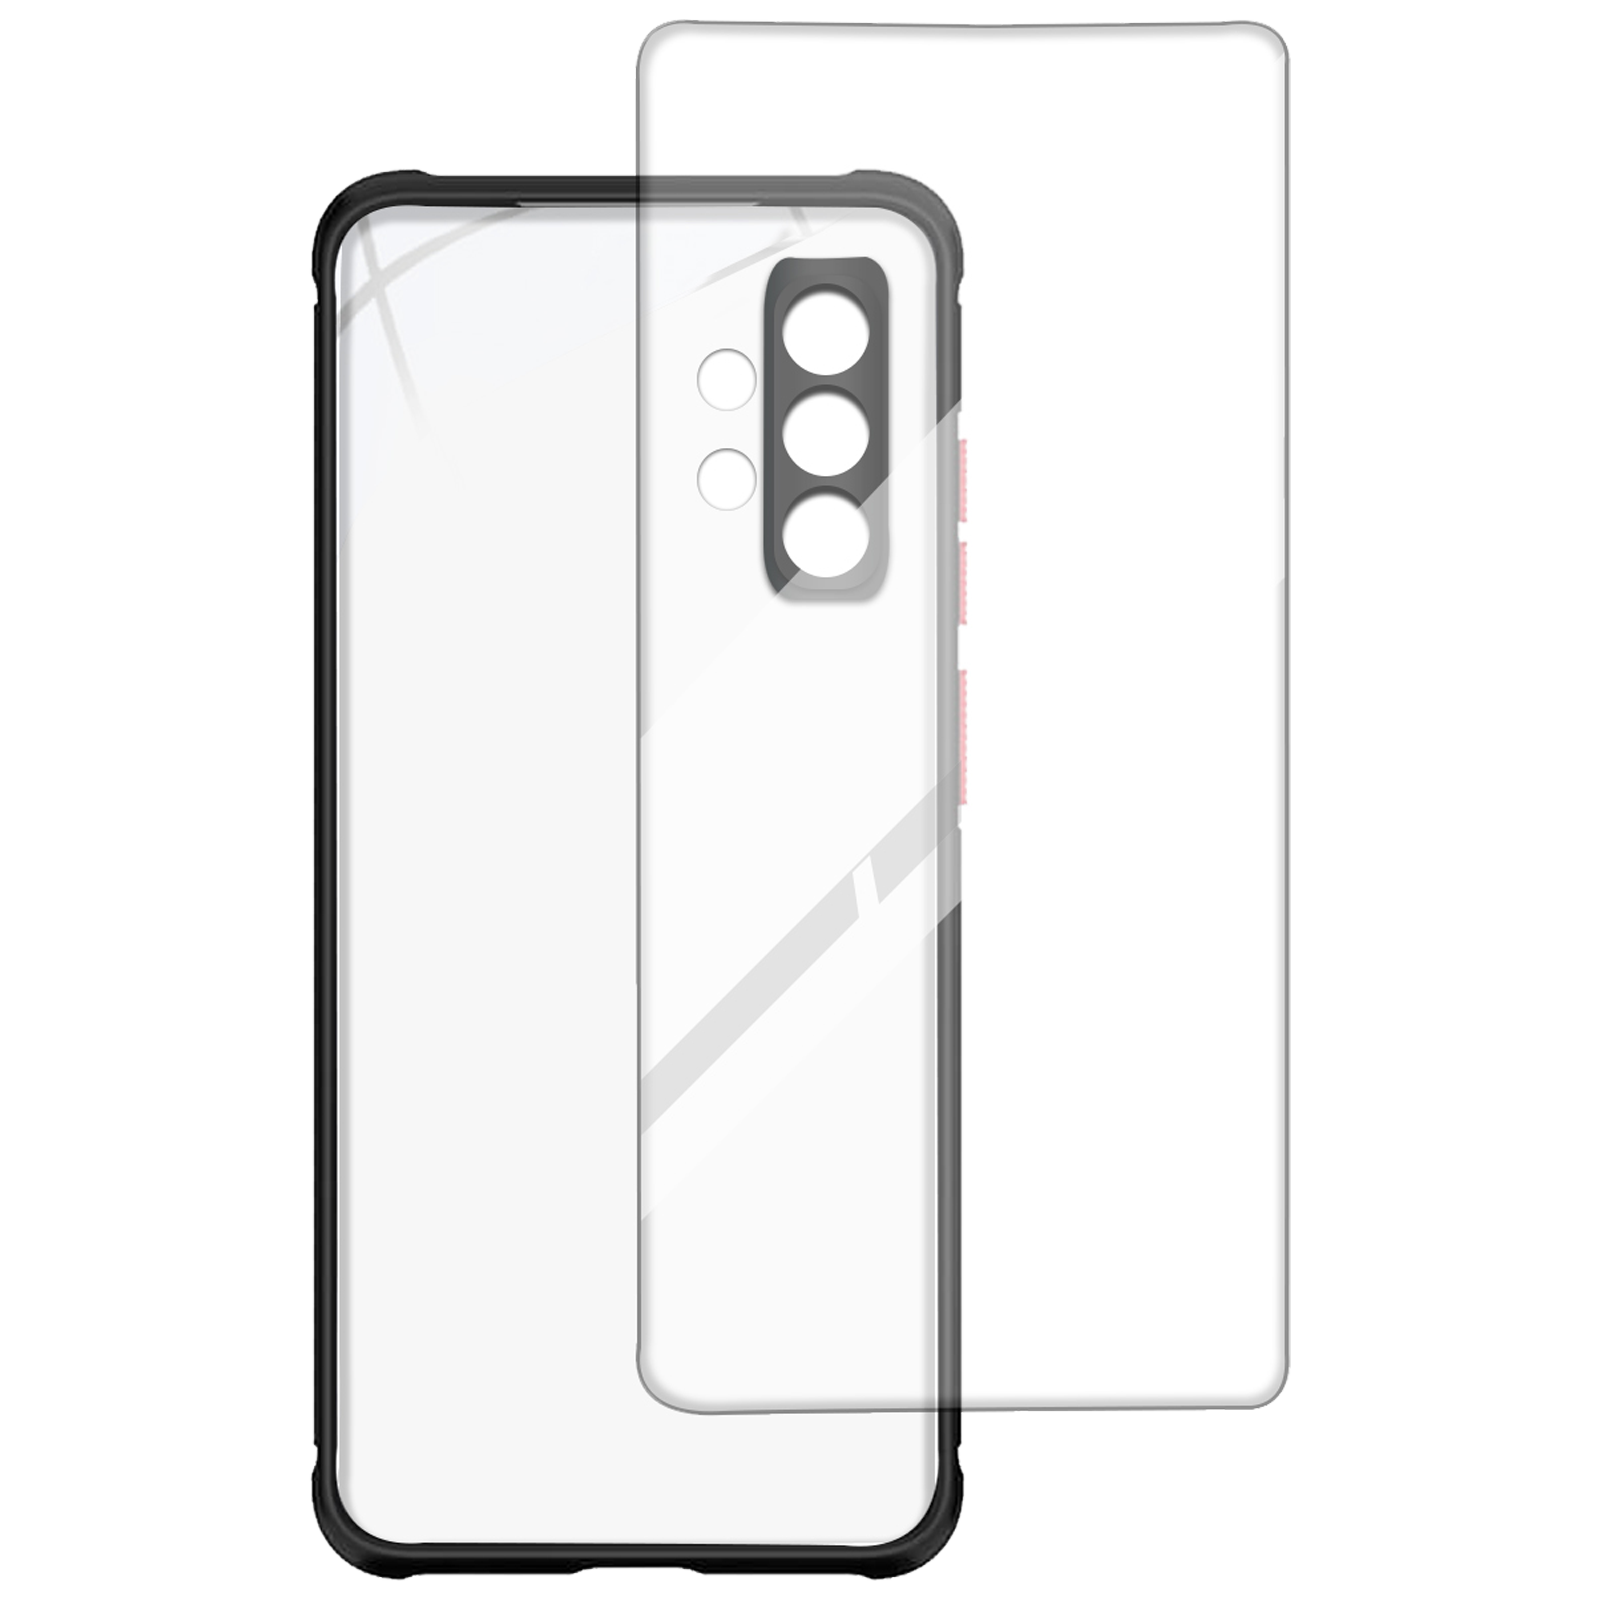 Arrow Hybrid Back Case and Screen Protector Bundle For Samsung Galaxy A32 (Ultra Transparent Visibility, AR-973, Black)_1